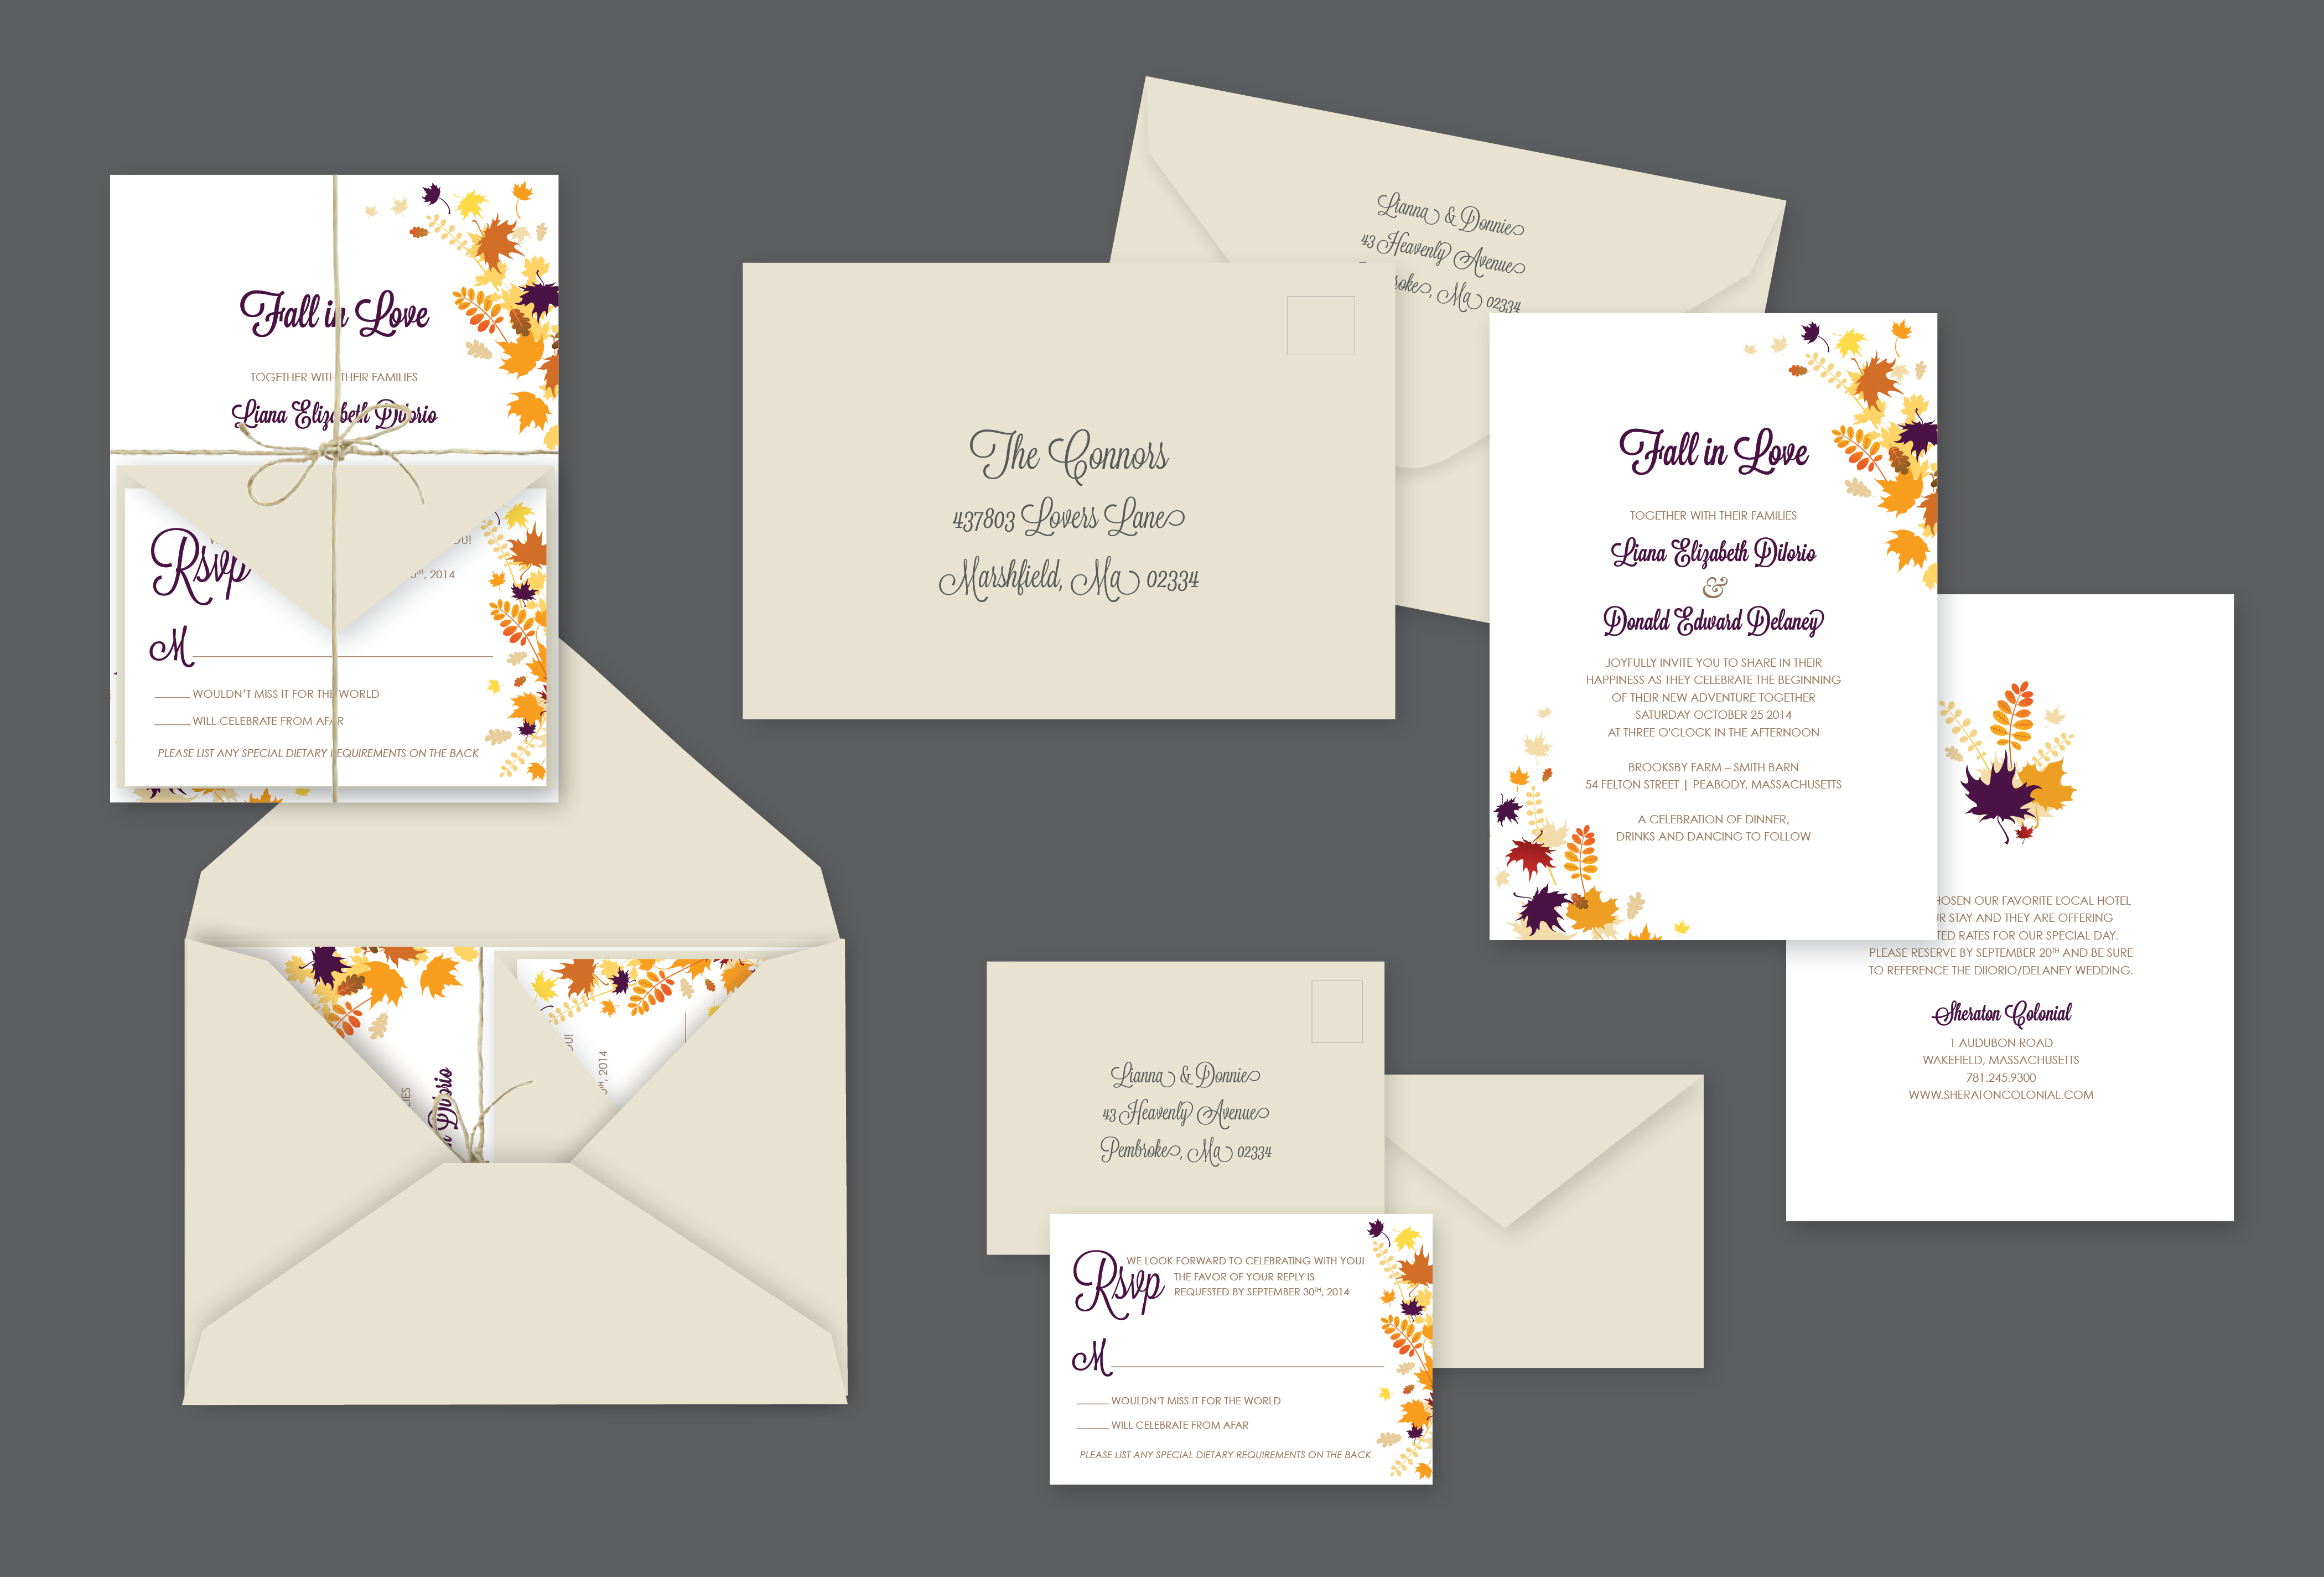 Wedding Invitation Rsvp is good invitation design